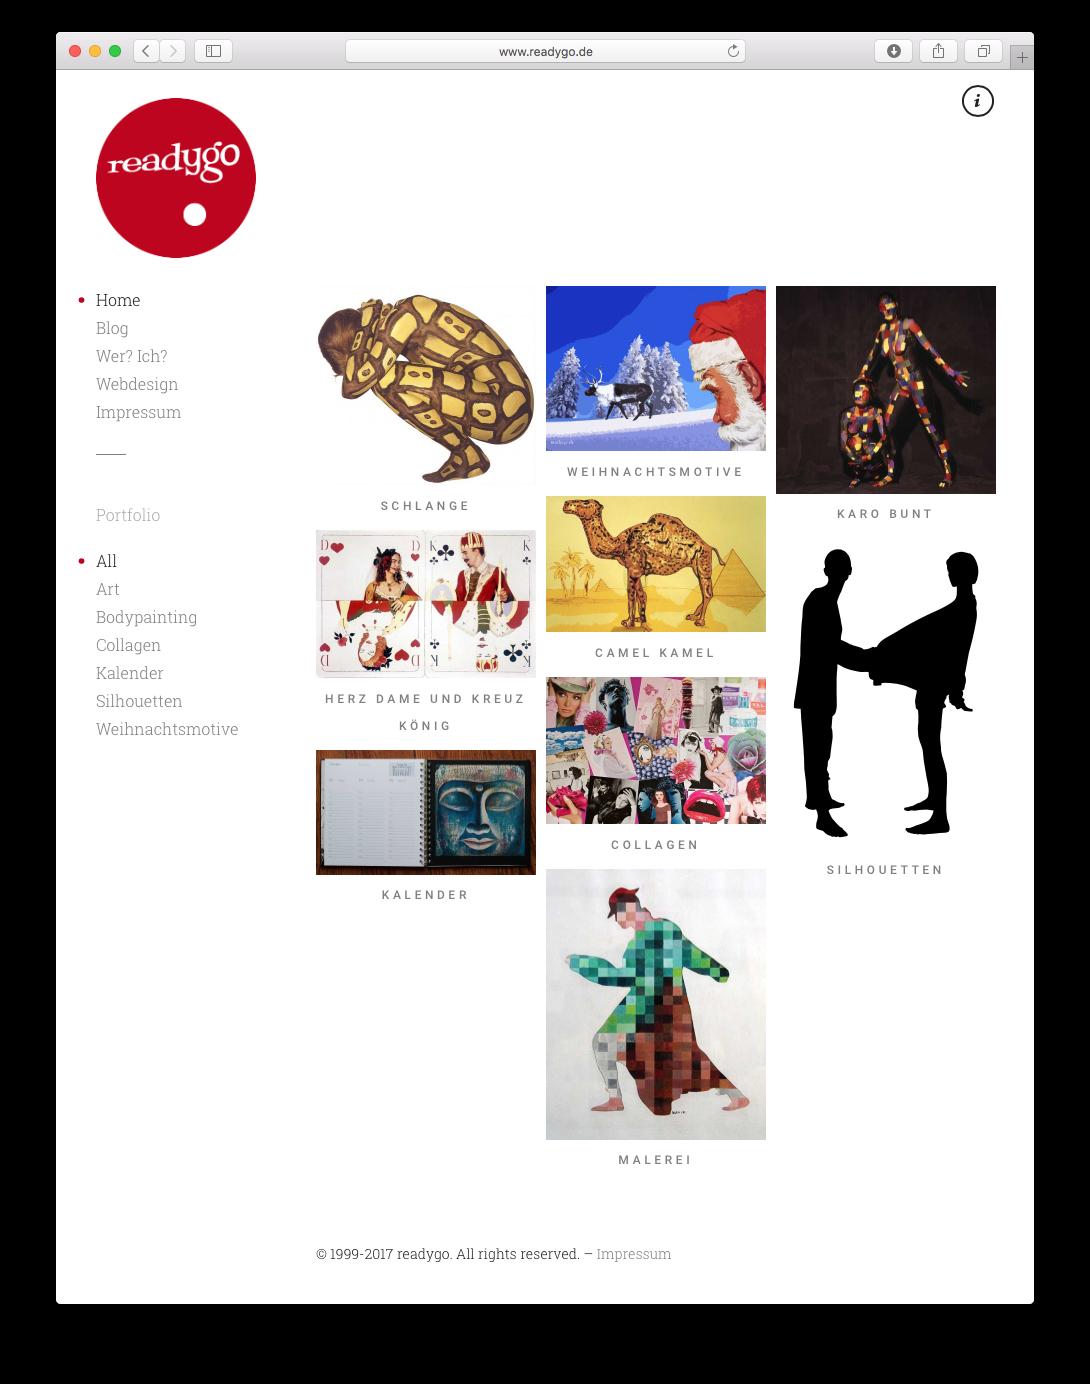 readygo-website-snapshot